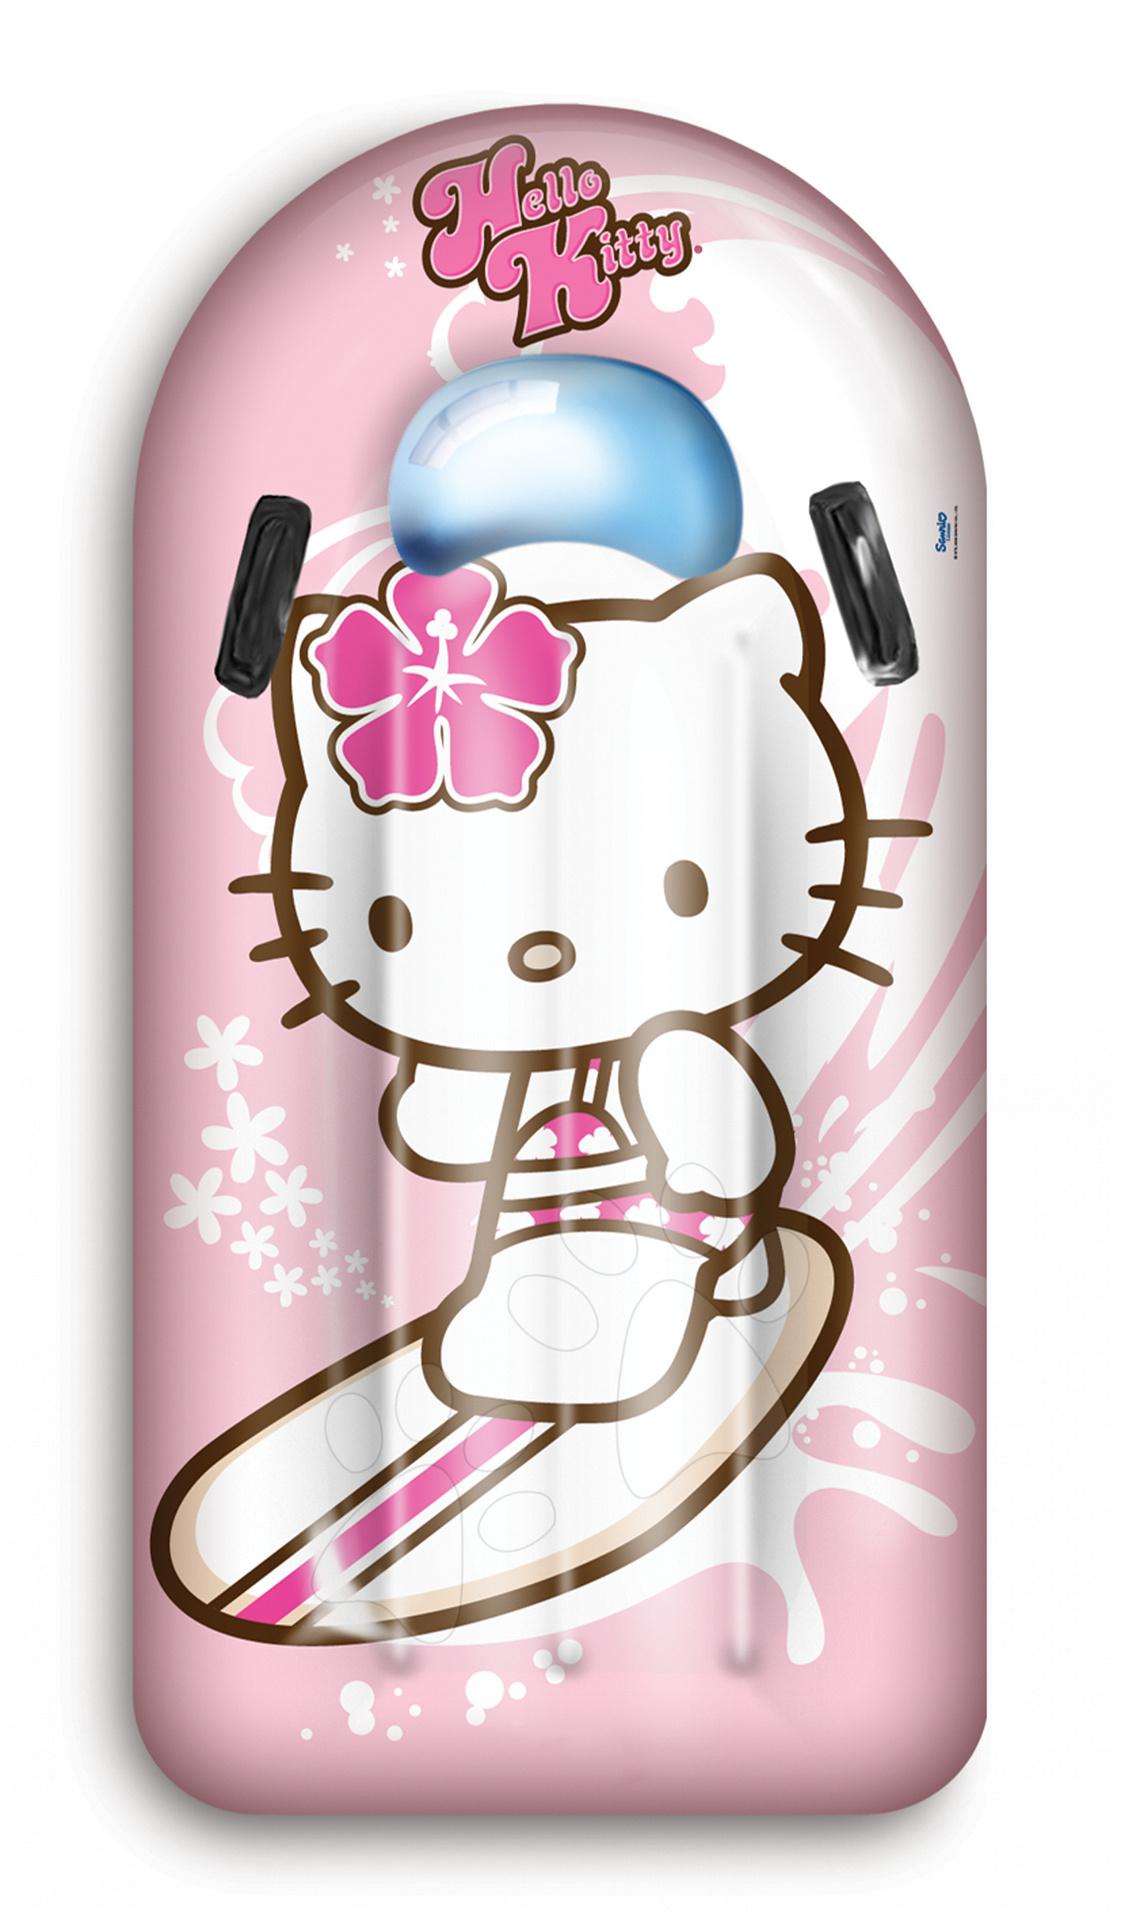 Saltele din cauciuc - Saltea gonflabilă de surf Hello Kitty Mondo Surf Rider 110 cm